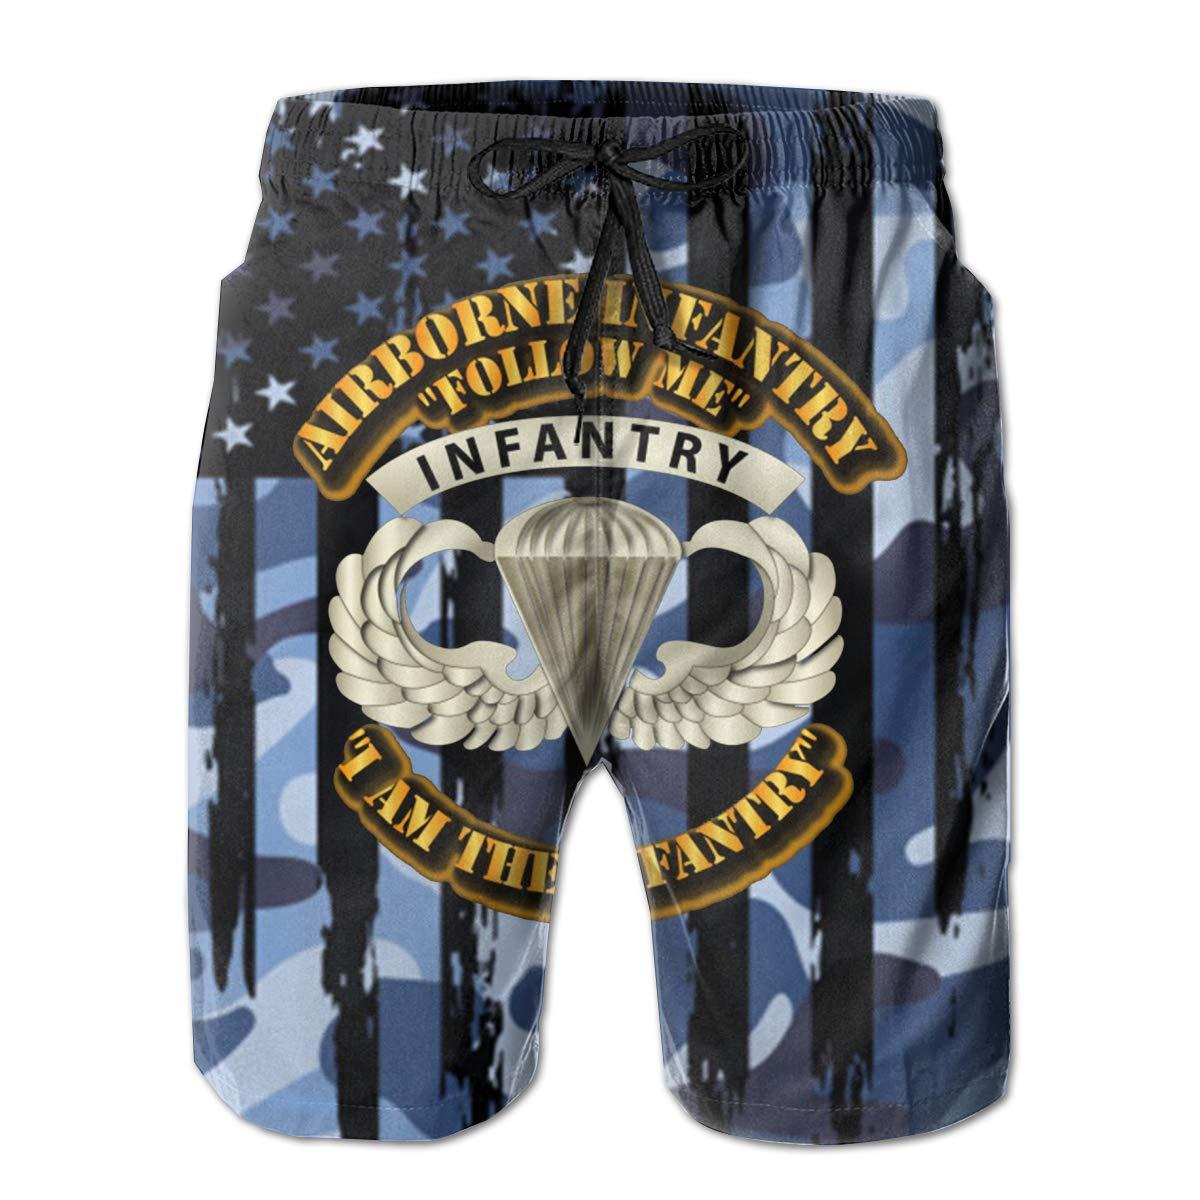 Airborne Badge Infantry Follow Me I Am The Infantry Mens Swim Trunks Bathing Suit Beach Shorts